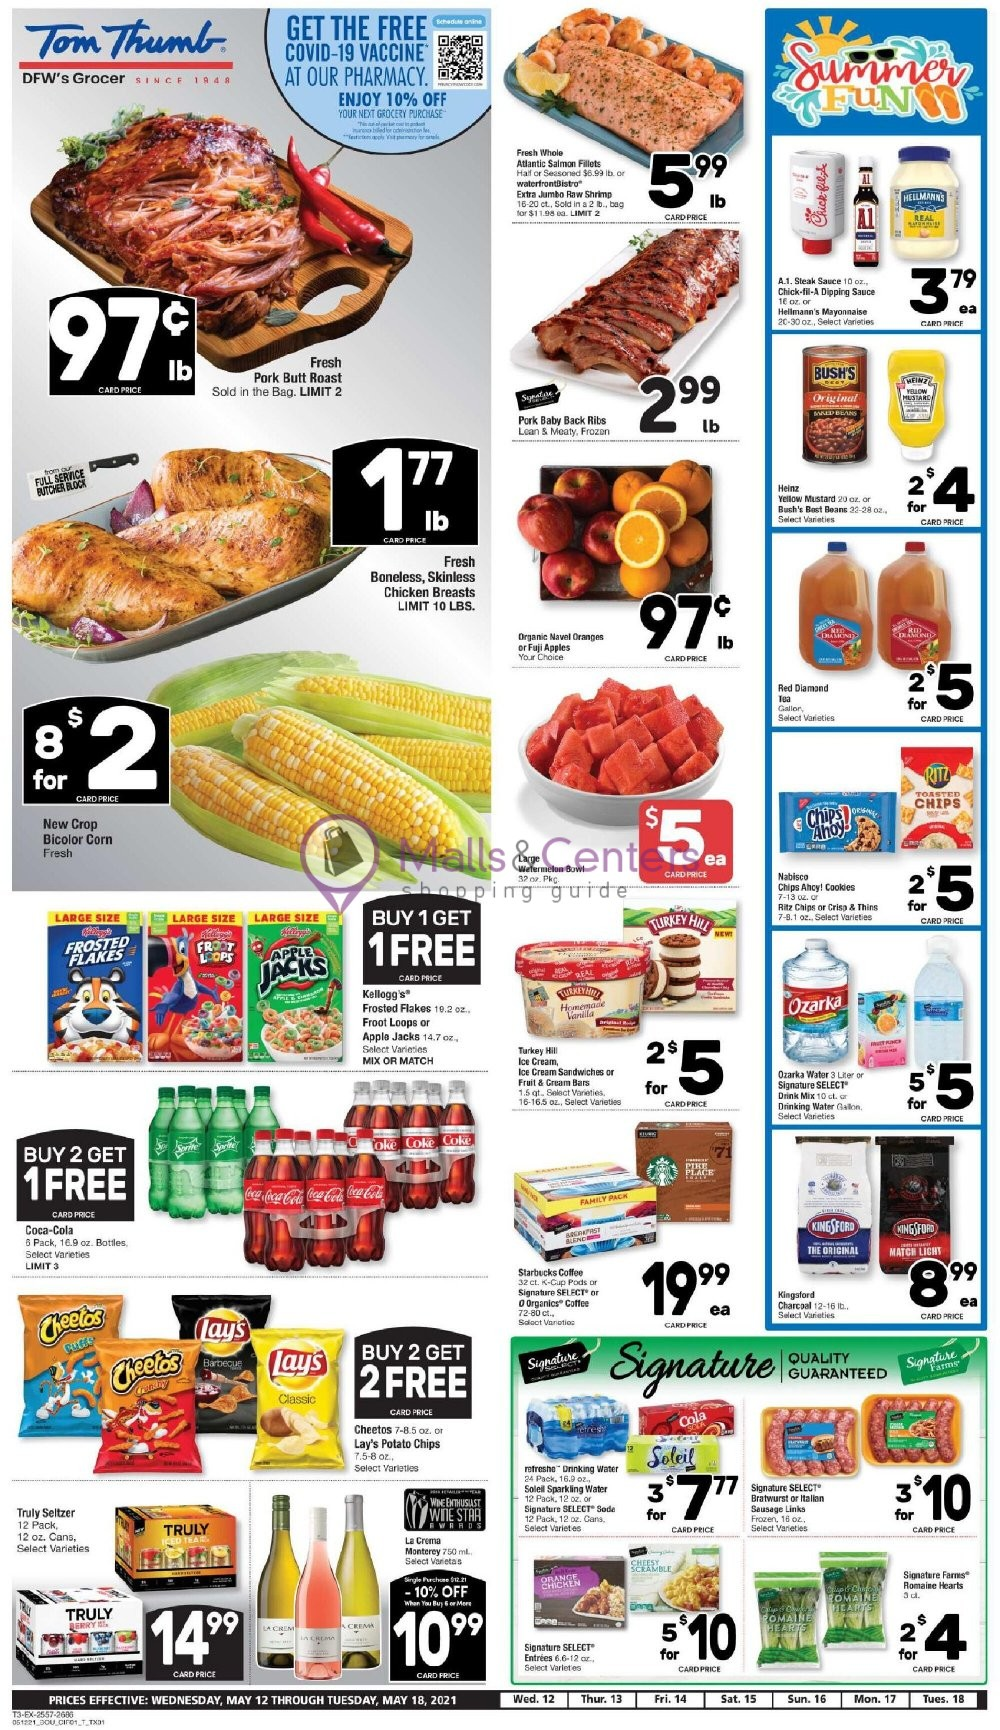 weekly ads Tom Thumb - page 1 - mallscenters.com